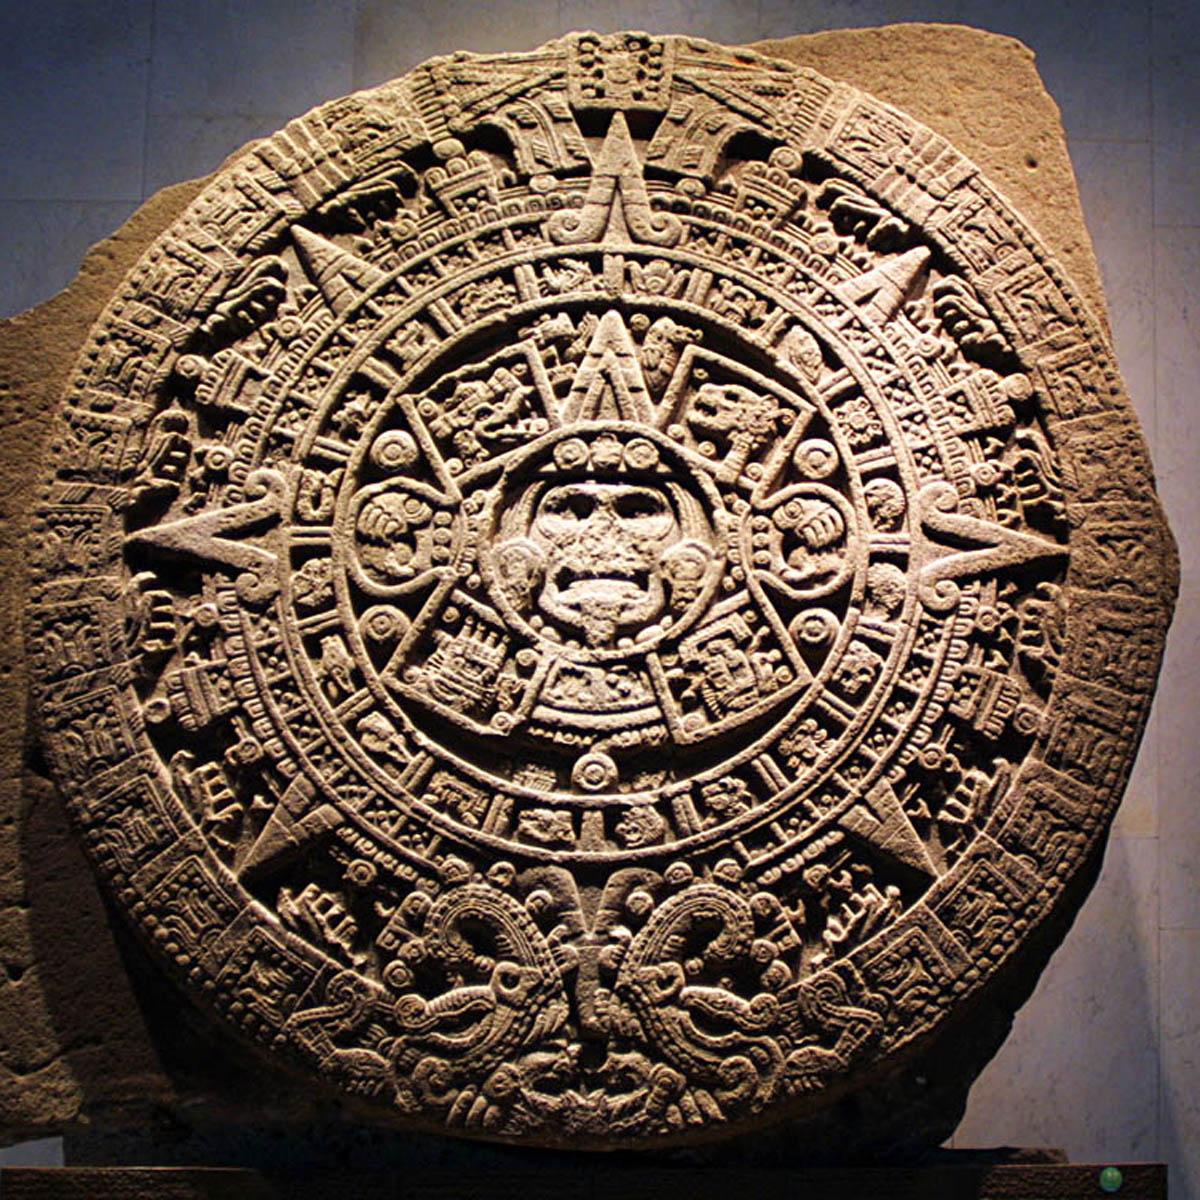 Indonesian Space Research: Peradaban Suku Maya